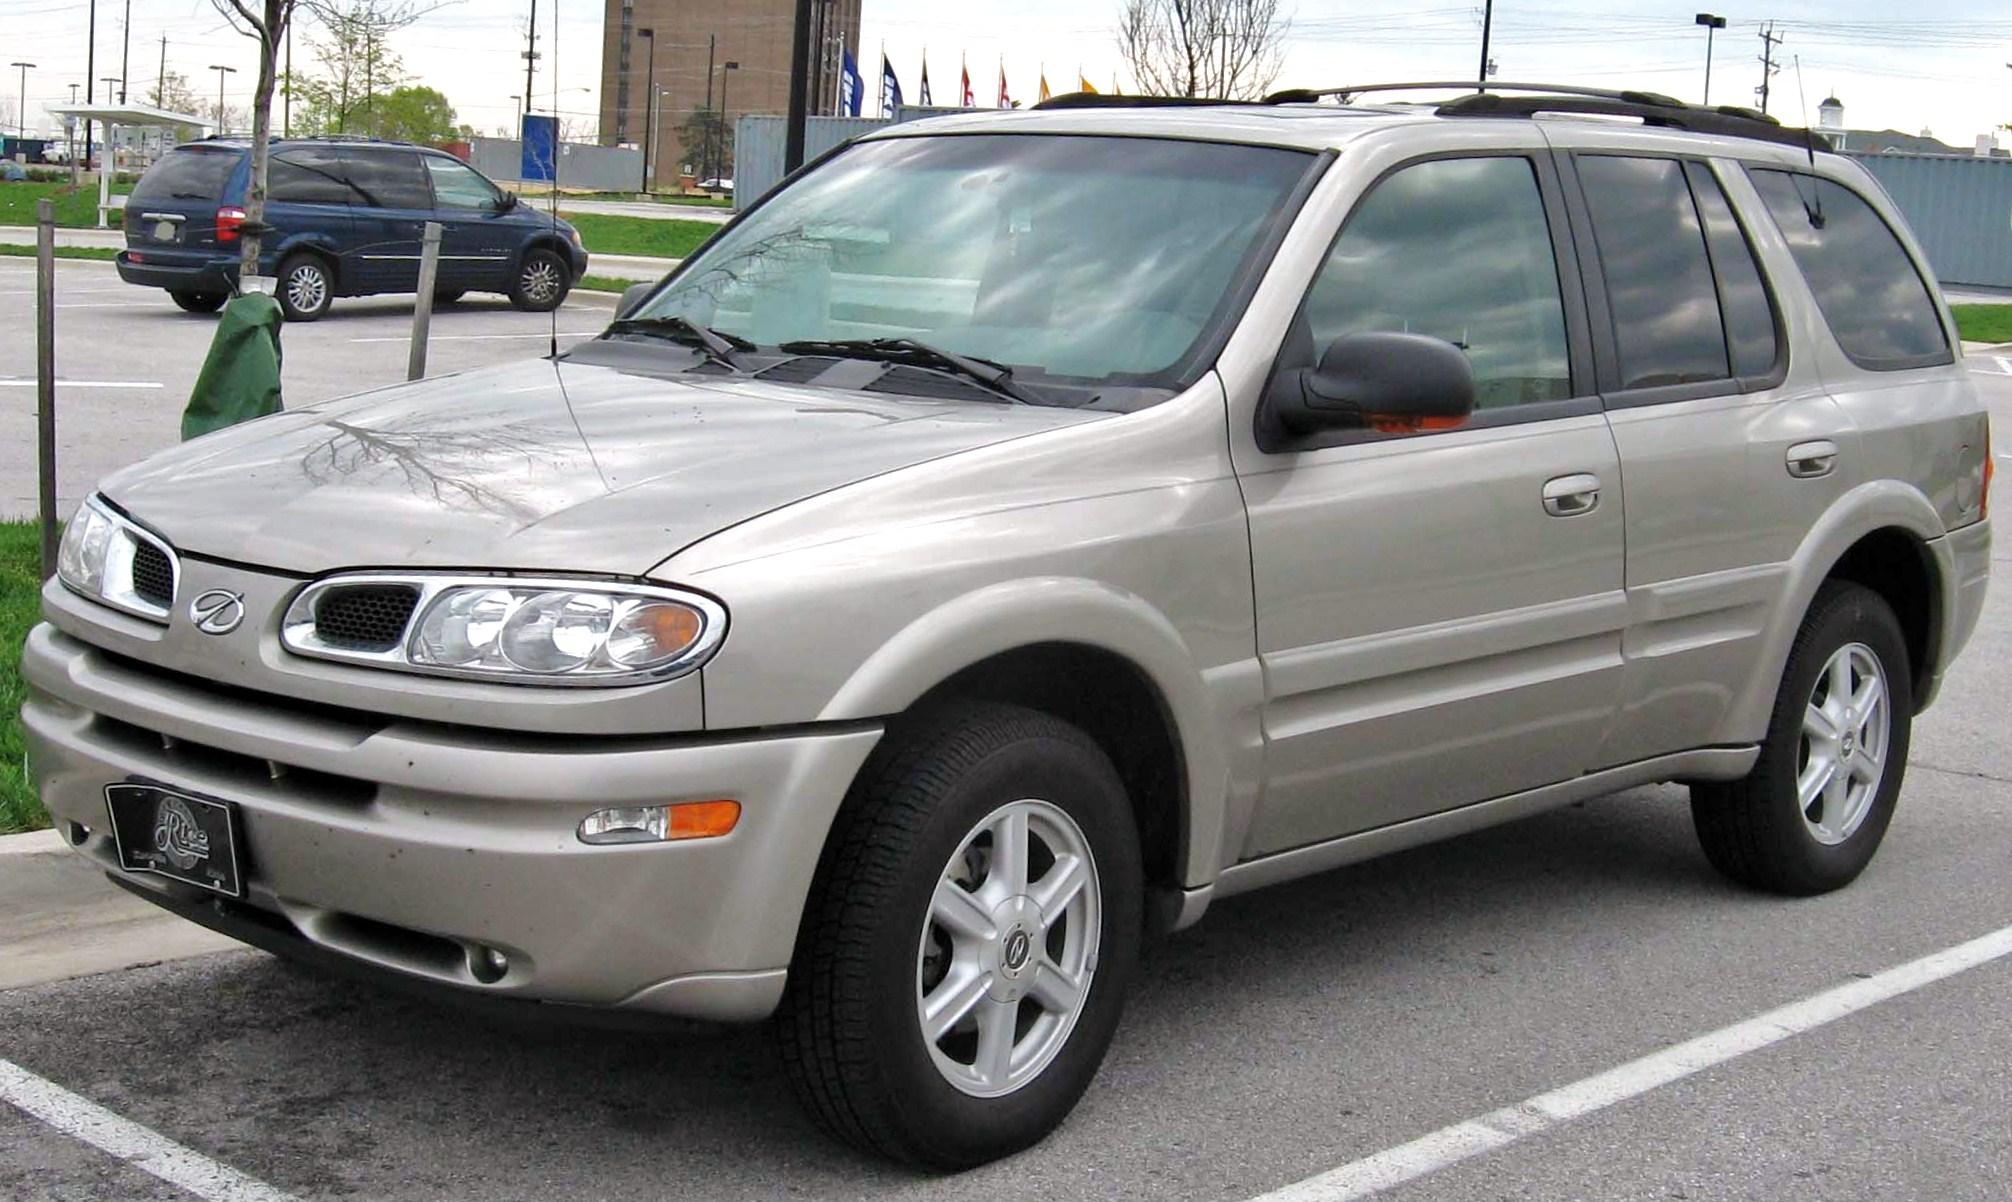 Oldsmobile Bravada III 2001 - 2004 SUV 5 door #6